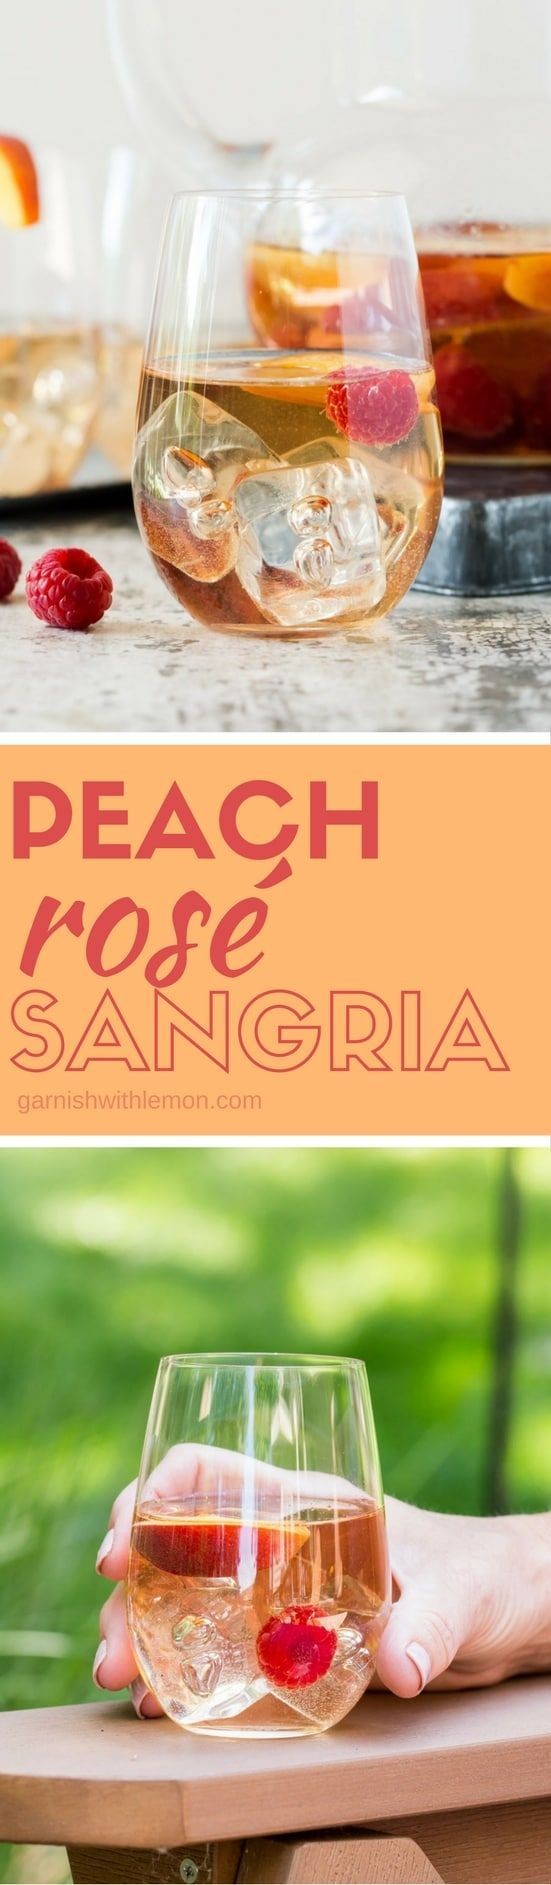 Rosé ALL Day! Sangria makes entertaining a breeze. Make a batch of this Peach Raspberry Sangria for your next party! #sangria #peach #rosé #batchcocktails